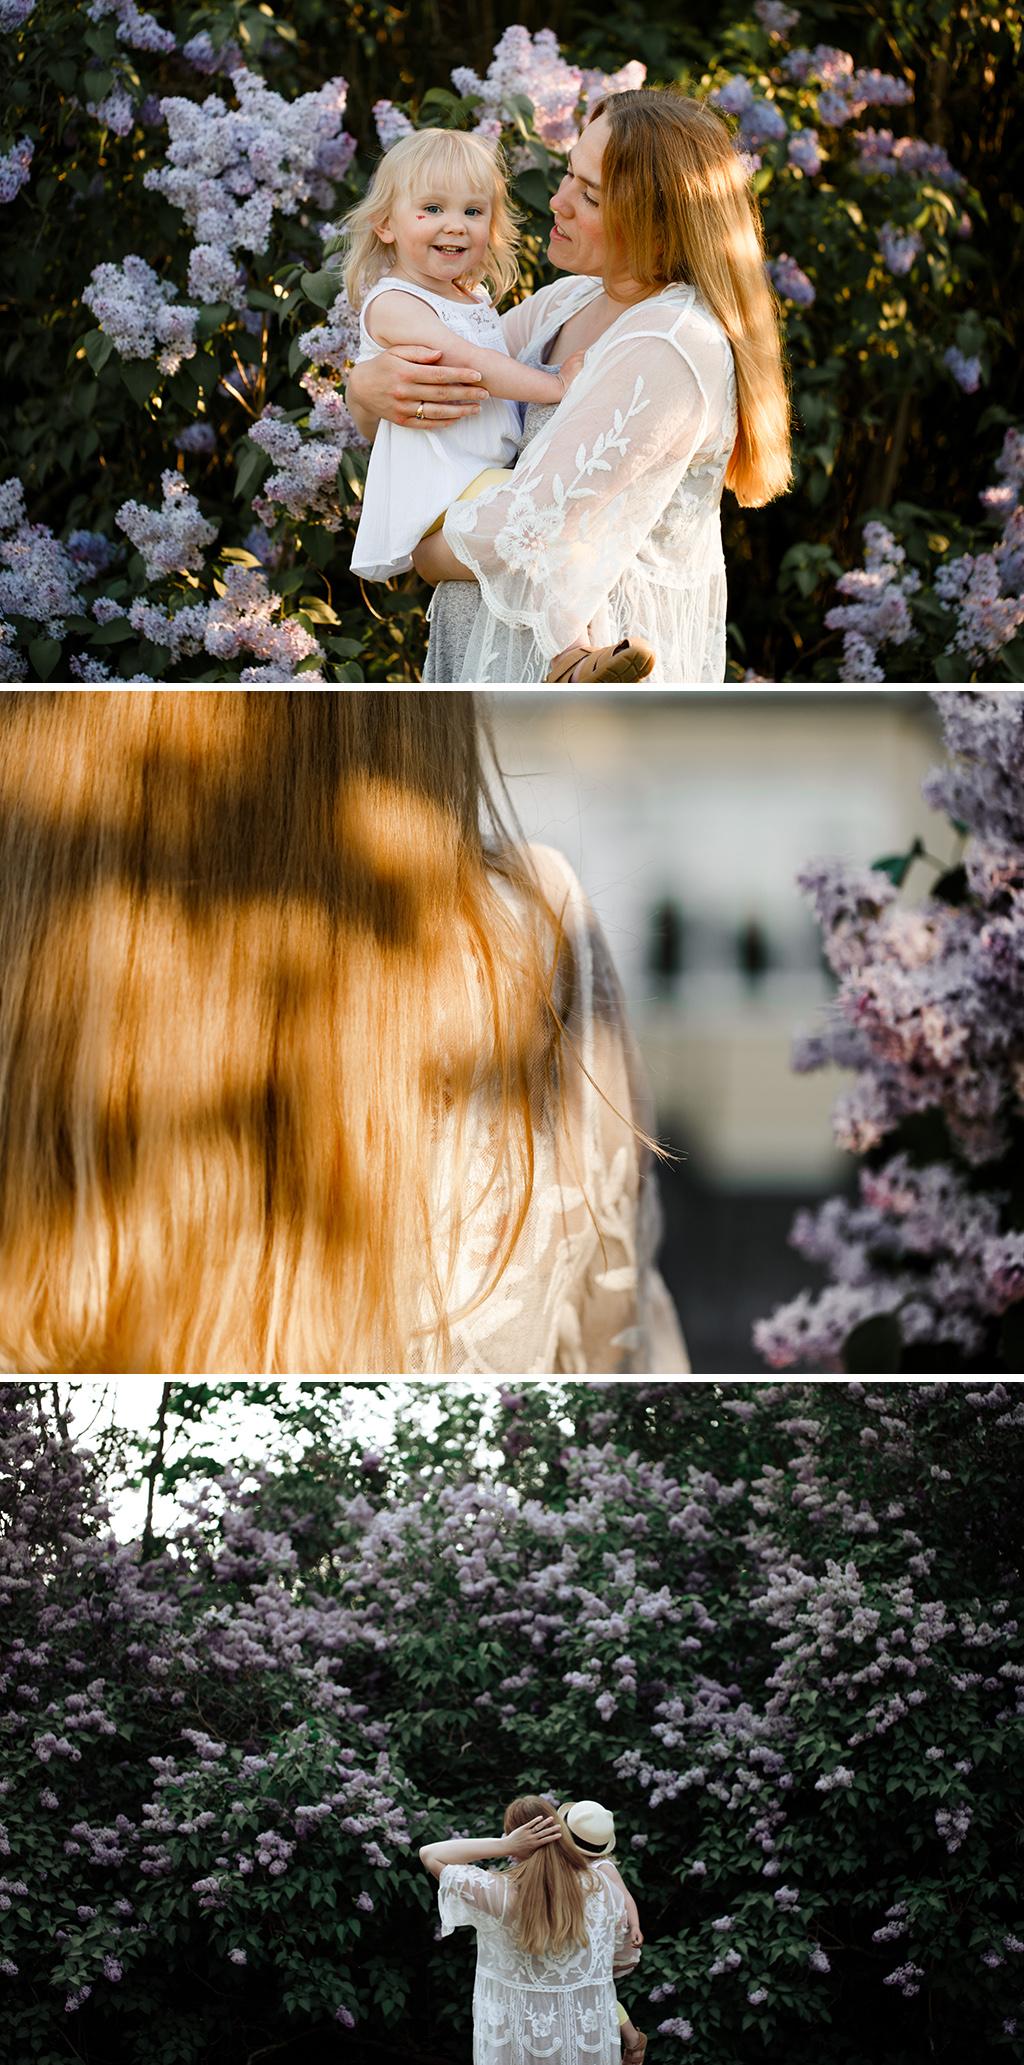 Familjefotograf_Stockholm_Syrener_familjefotografering_8.jpg